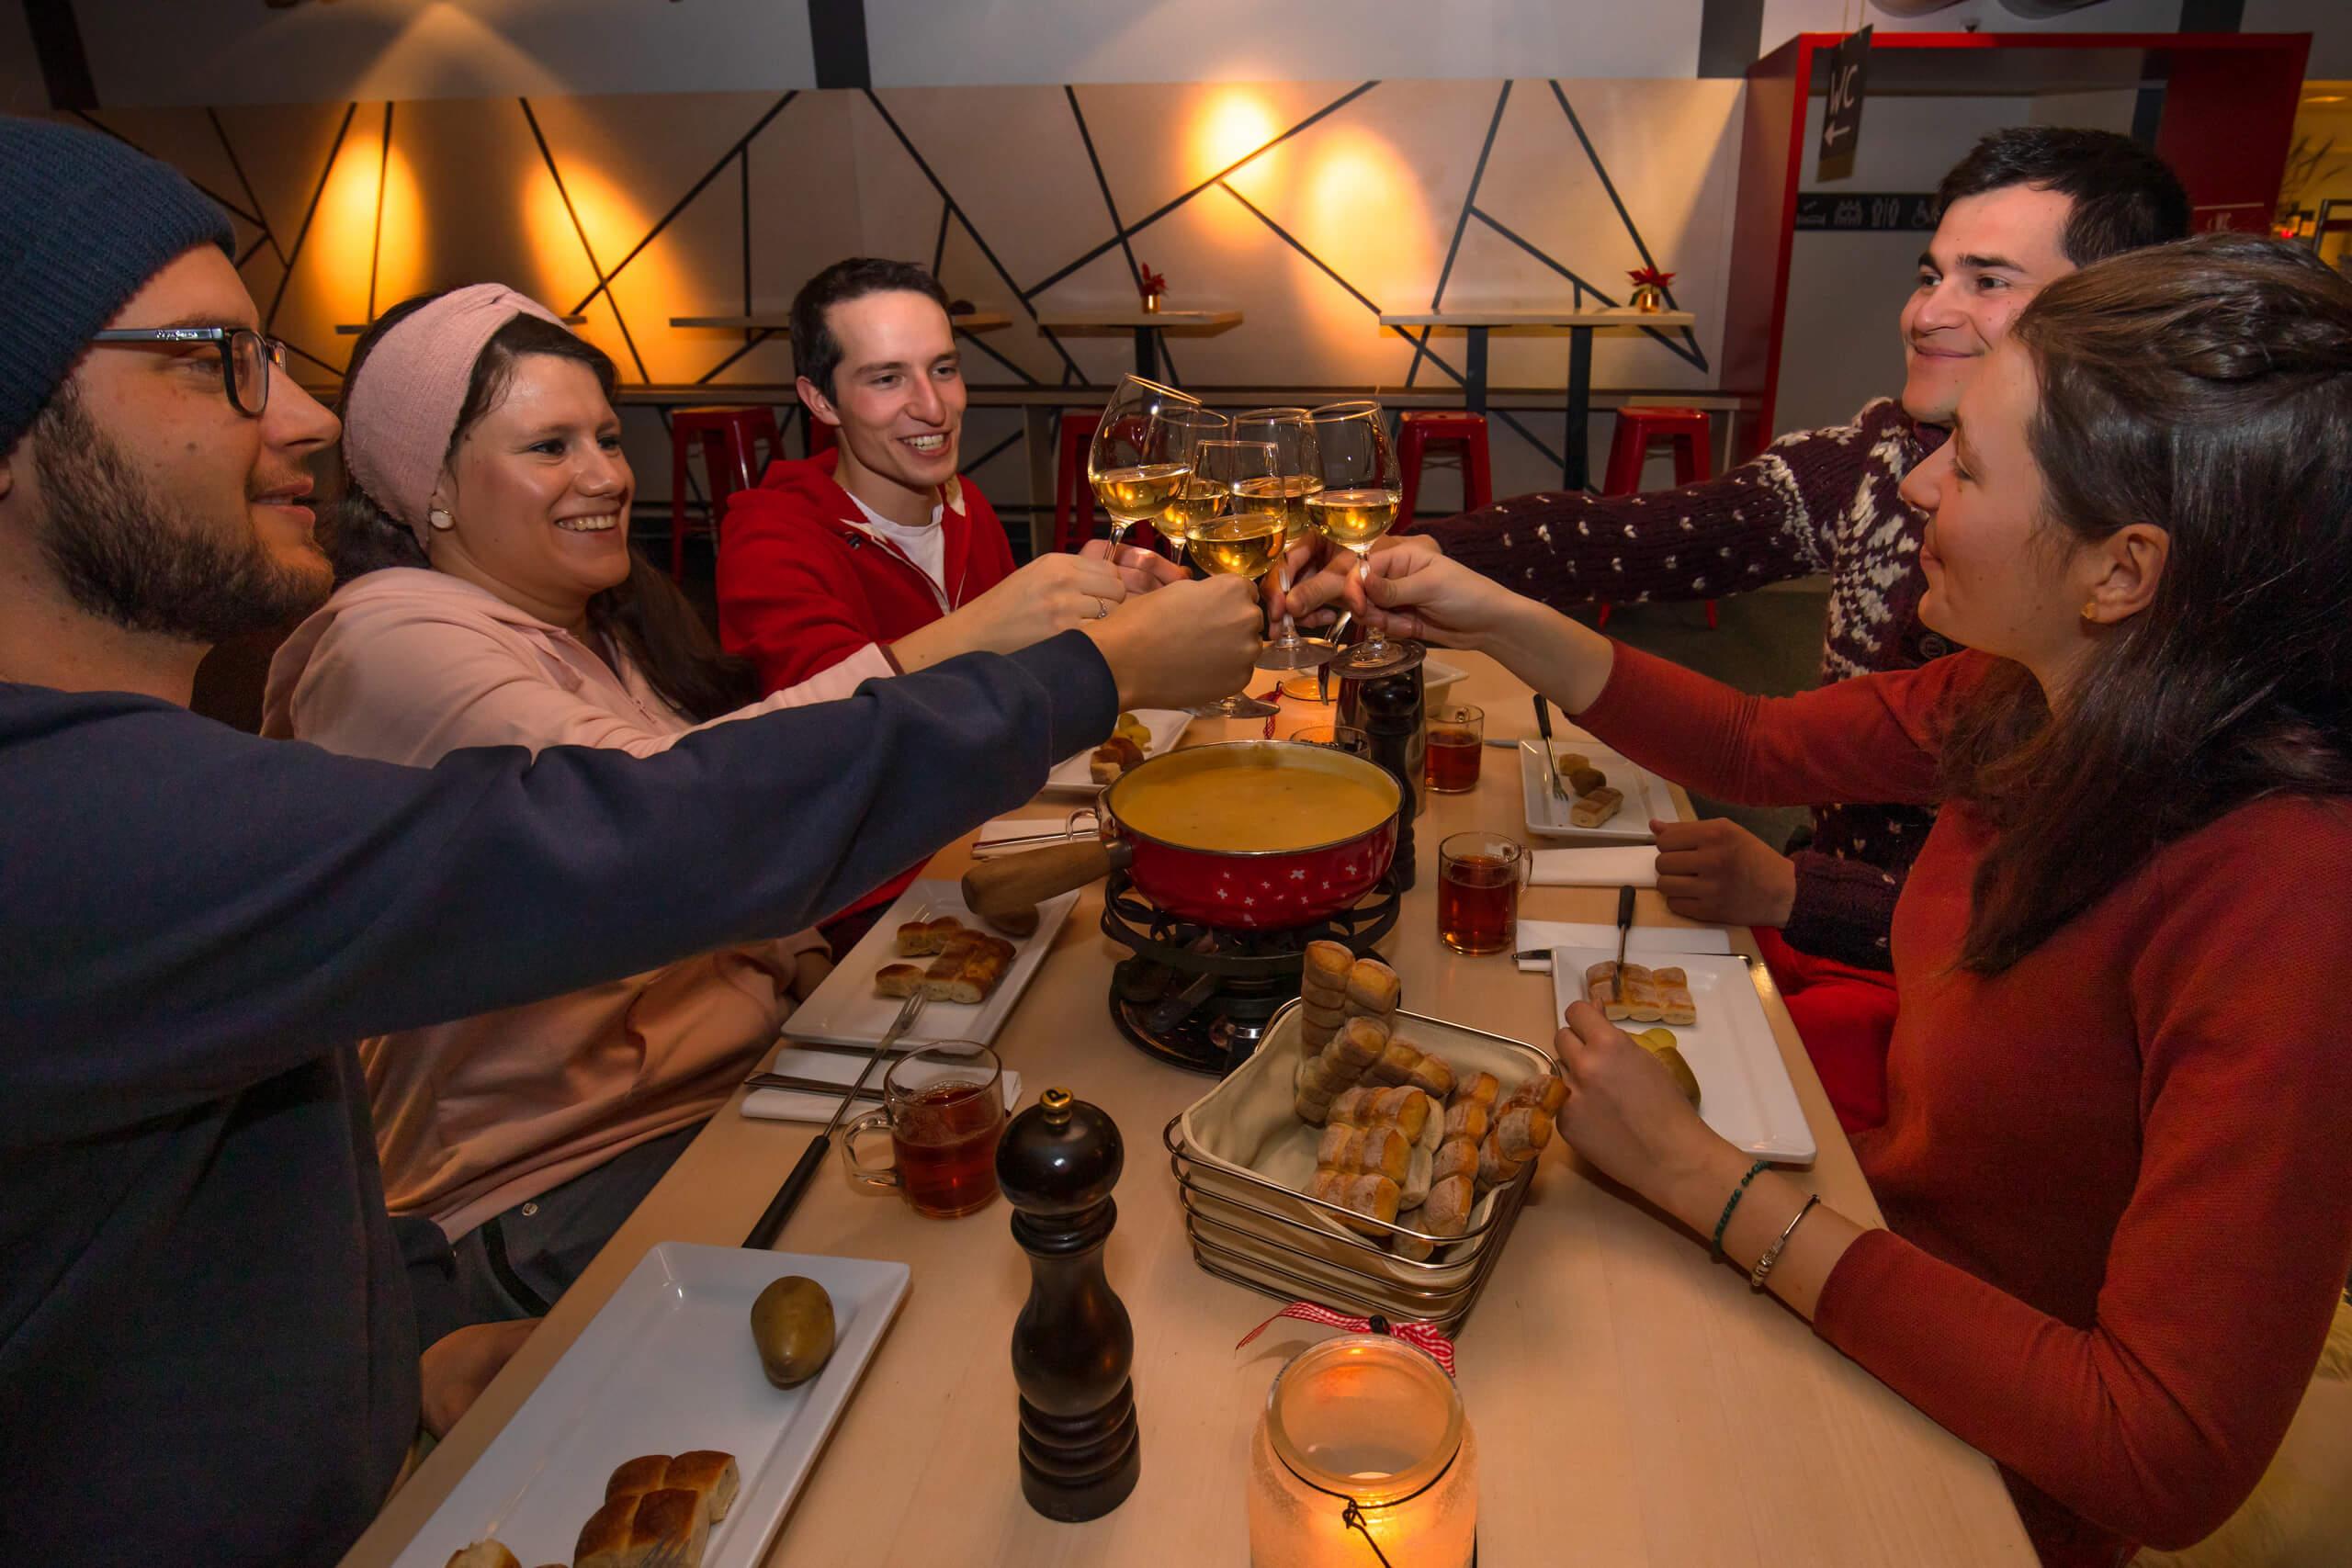 niederhorn-sternenschlitteln-fondue-nachtessen-gertraenke